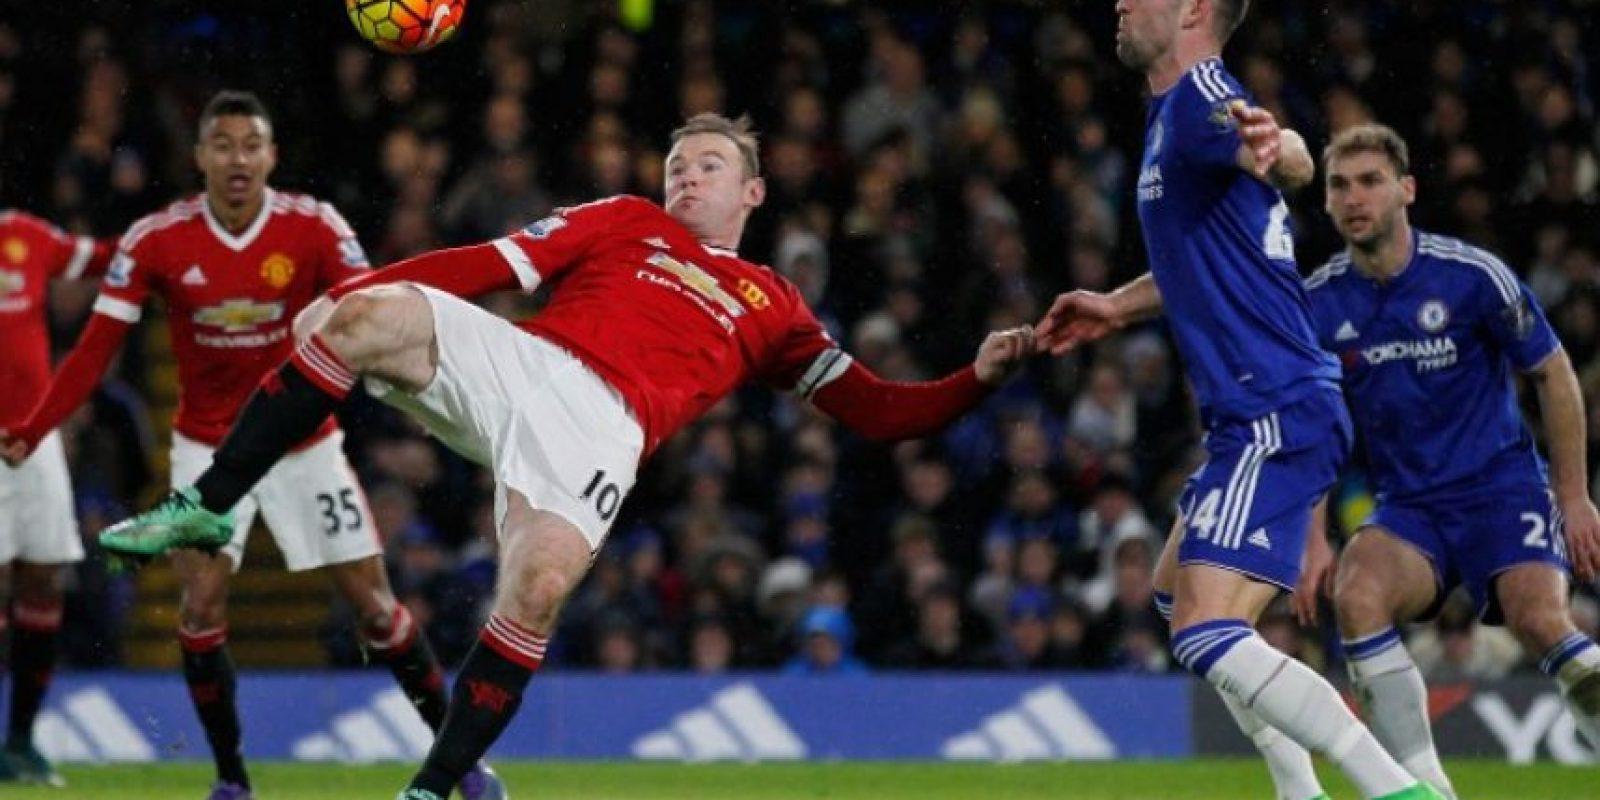 Wayne Rooney, del Manchester United, se prepara para hacer un remate, frente a Gary Cahill, del Chelsea. Foto:AFP